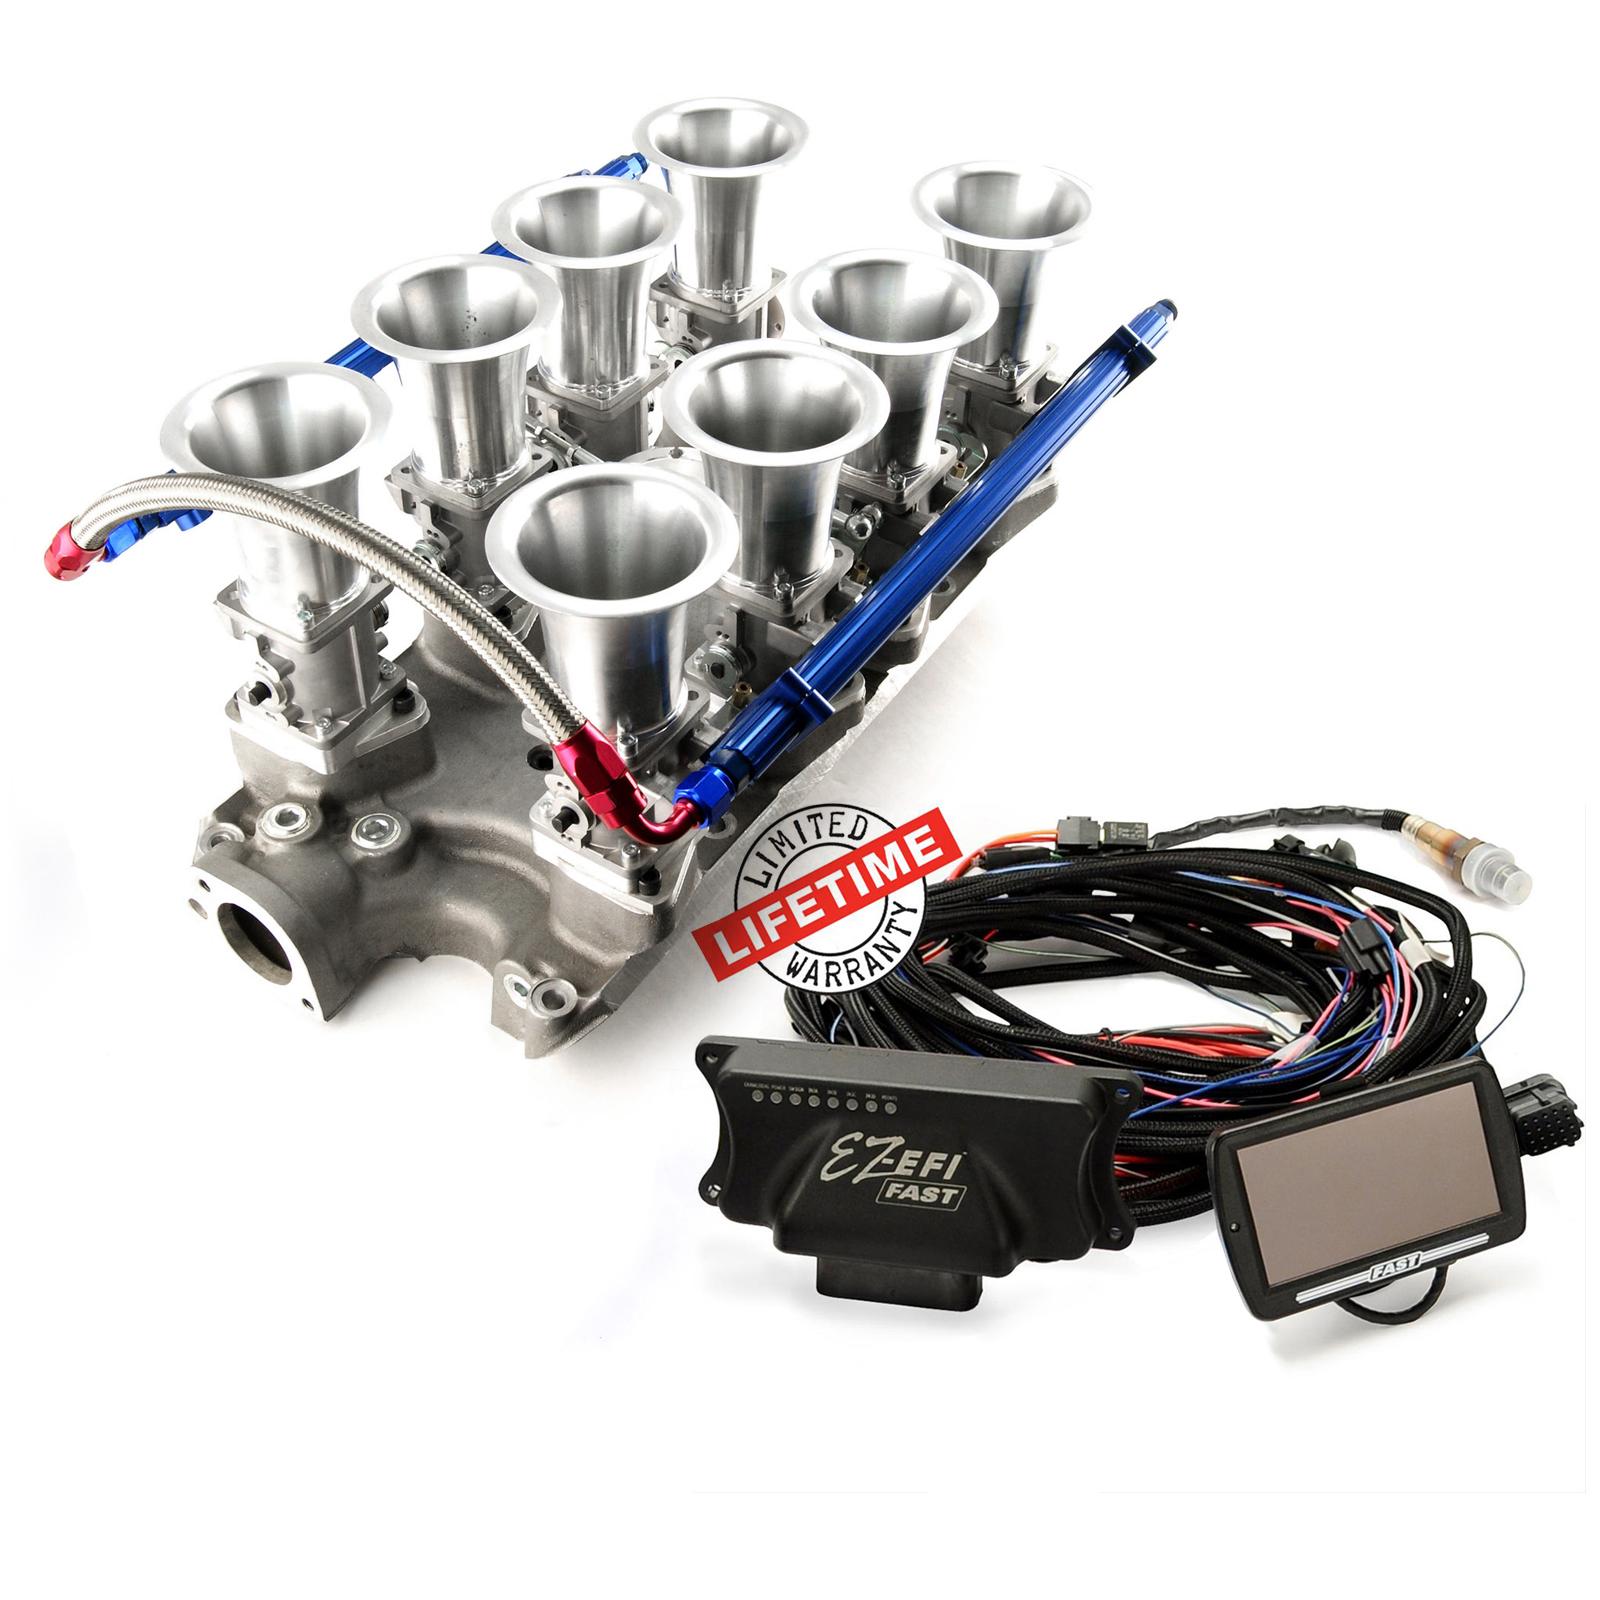 fits Ford 351W    Windsor    Manifold   30404 FAST EZEFI 20    Fuel       Injection    System   eBay